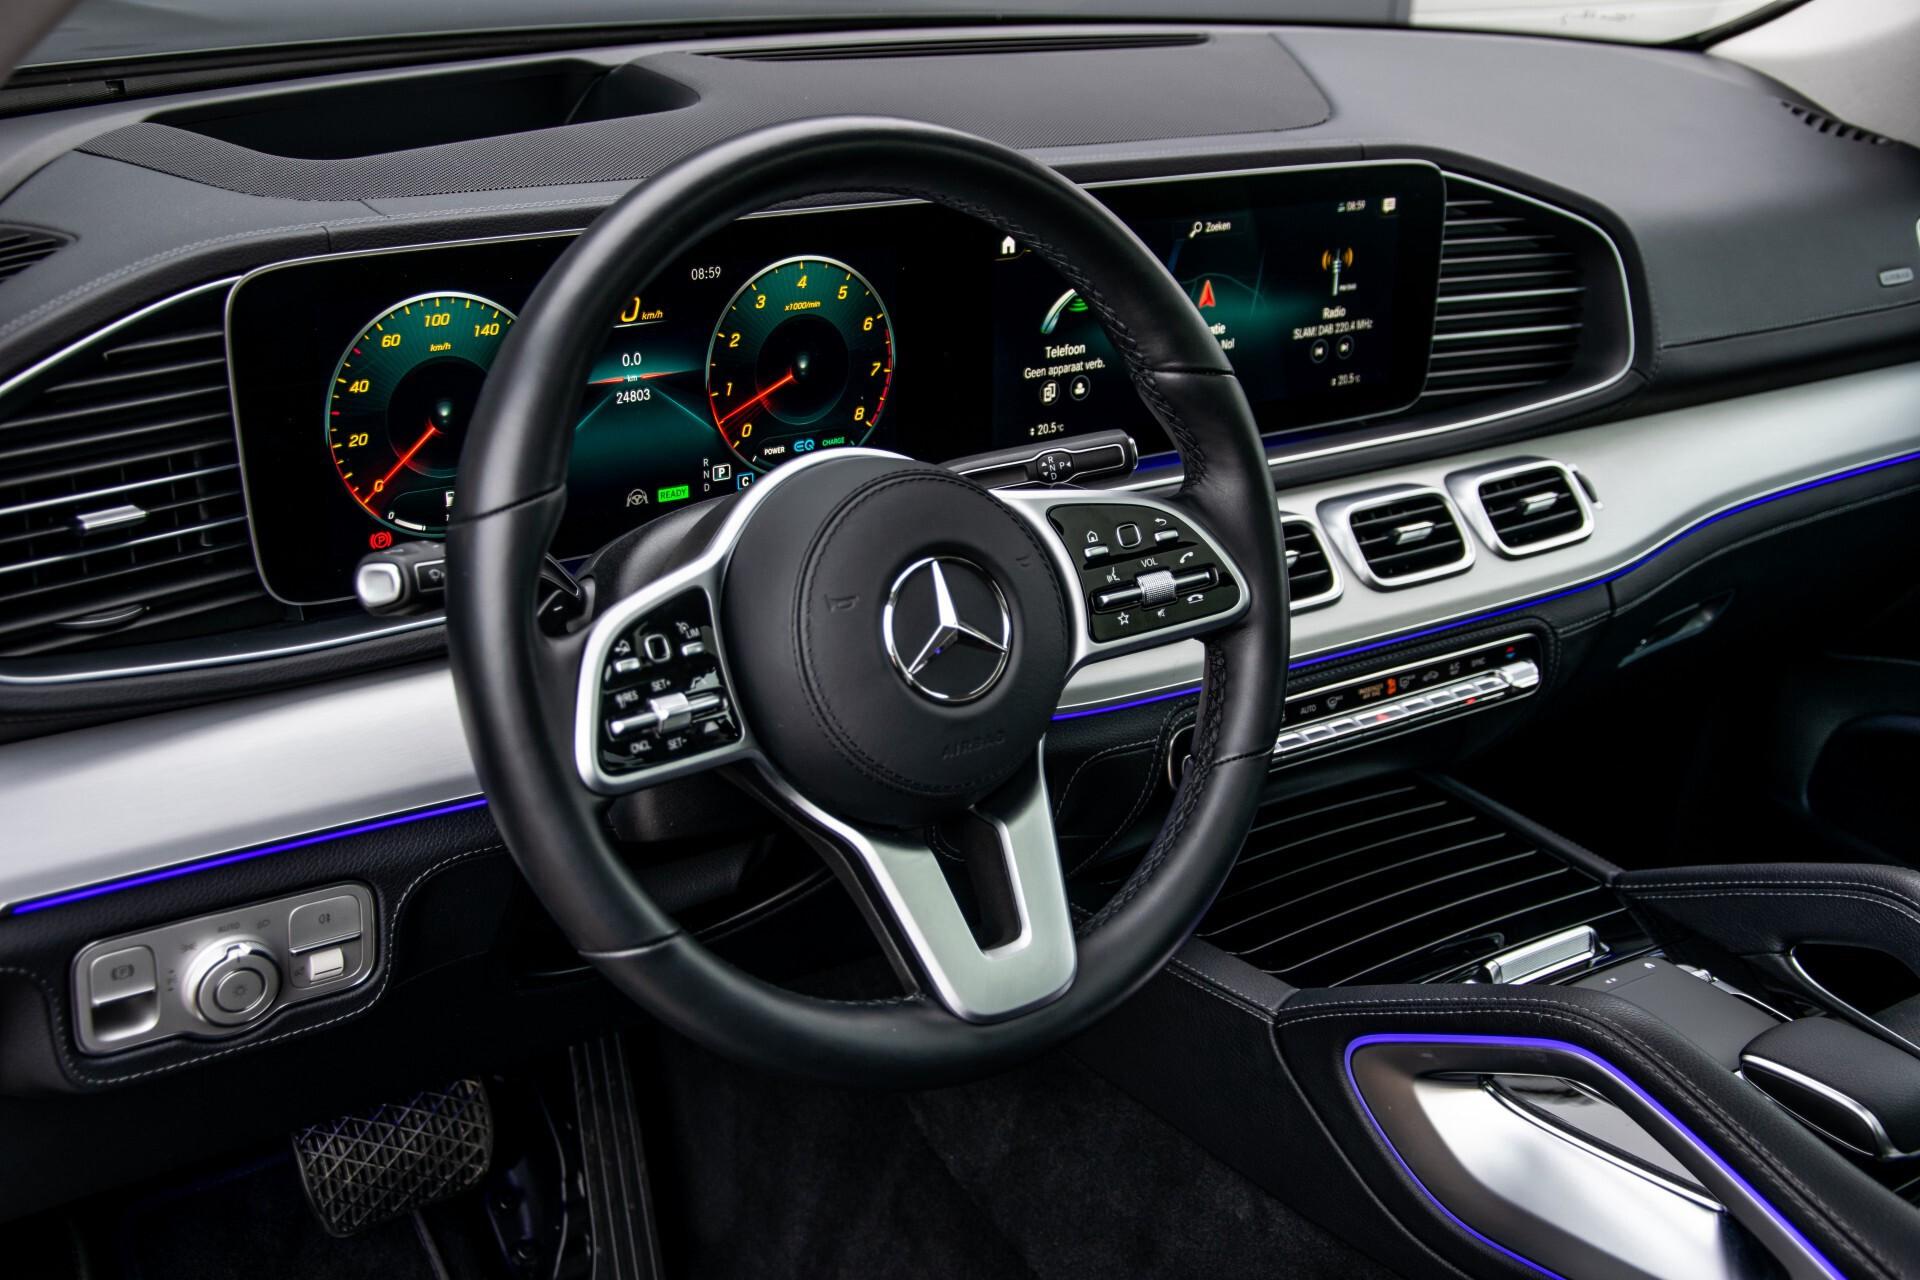 Mercedes-Benz GLE 450 4-M 7-Persoons AMG Massage/Rij-assist/Keyless/TV/360/Night/Trekhaak Aut9 Foto 19